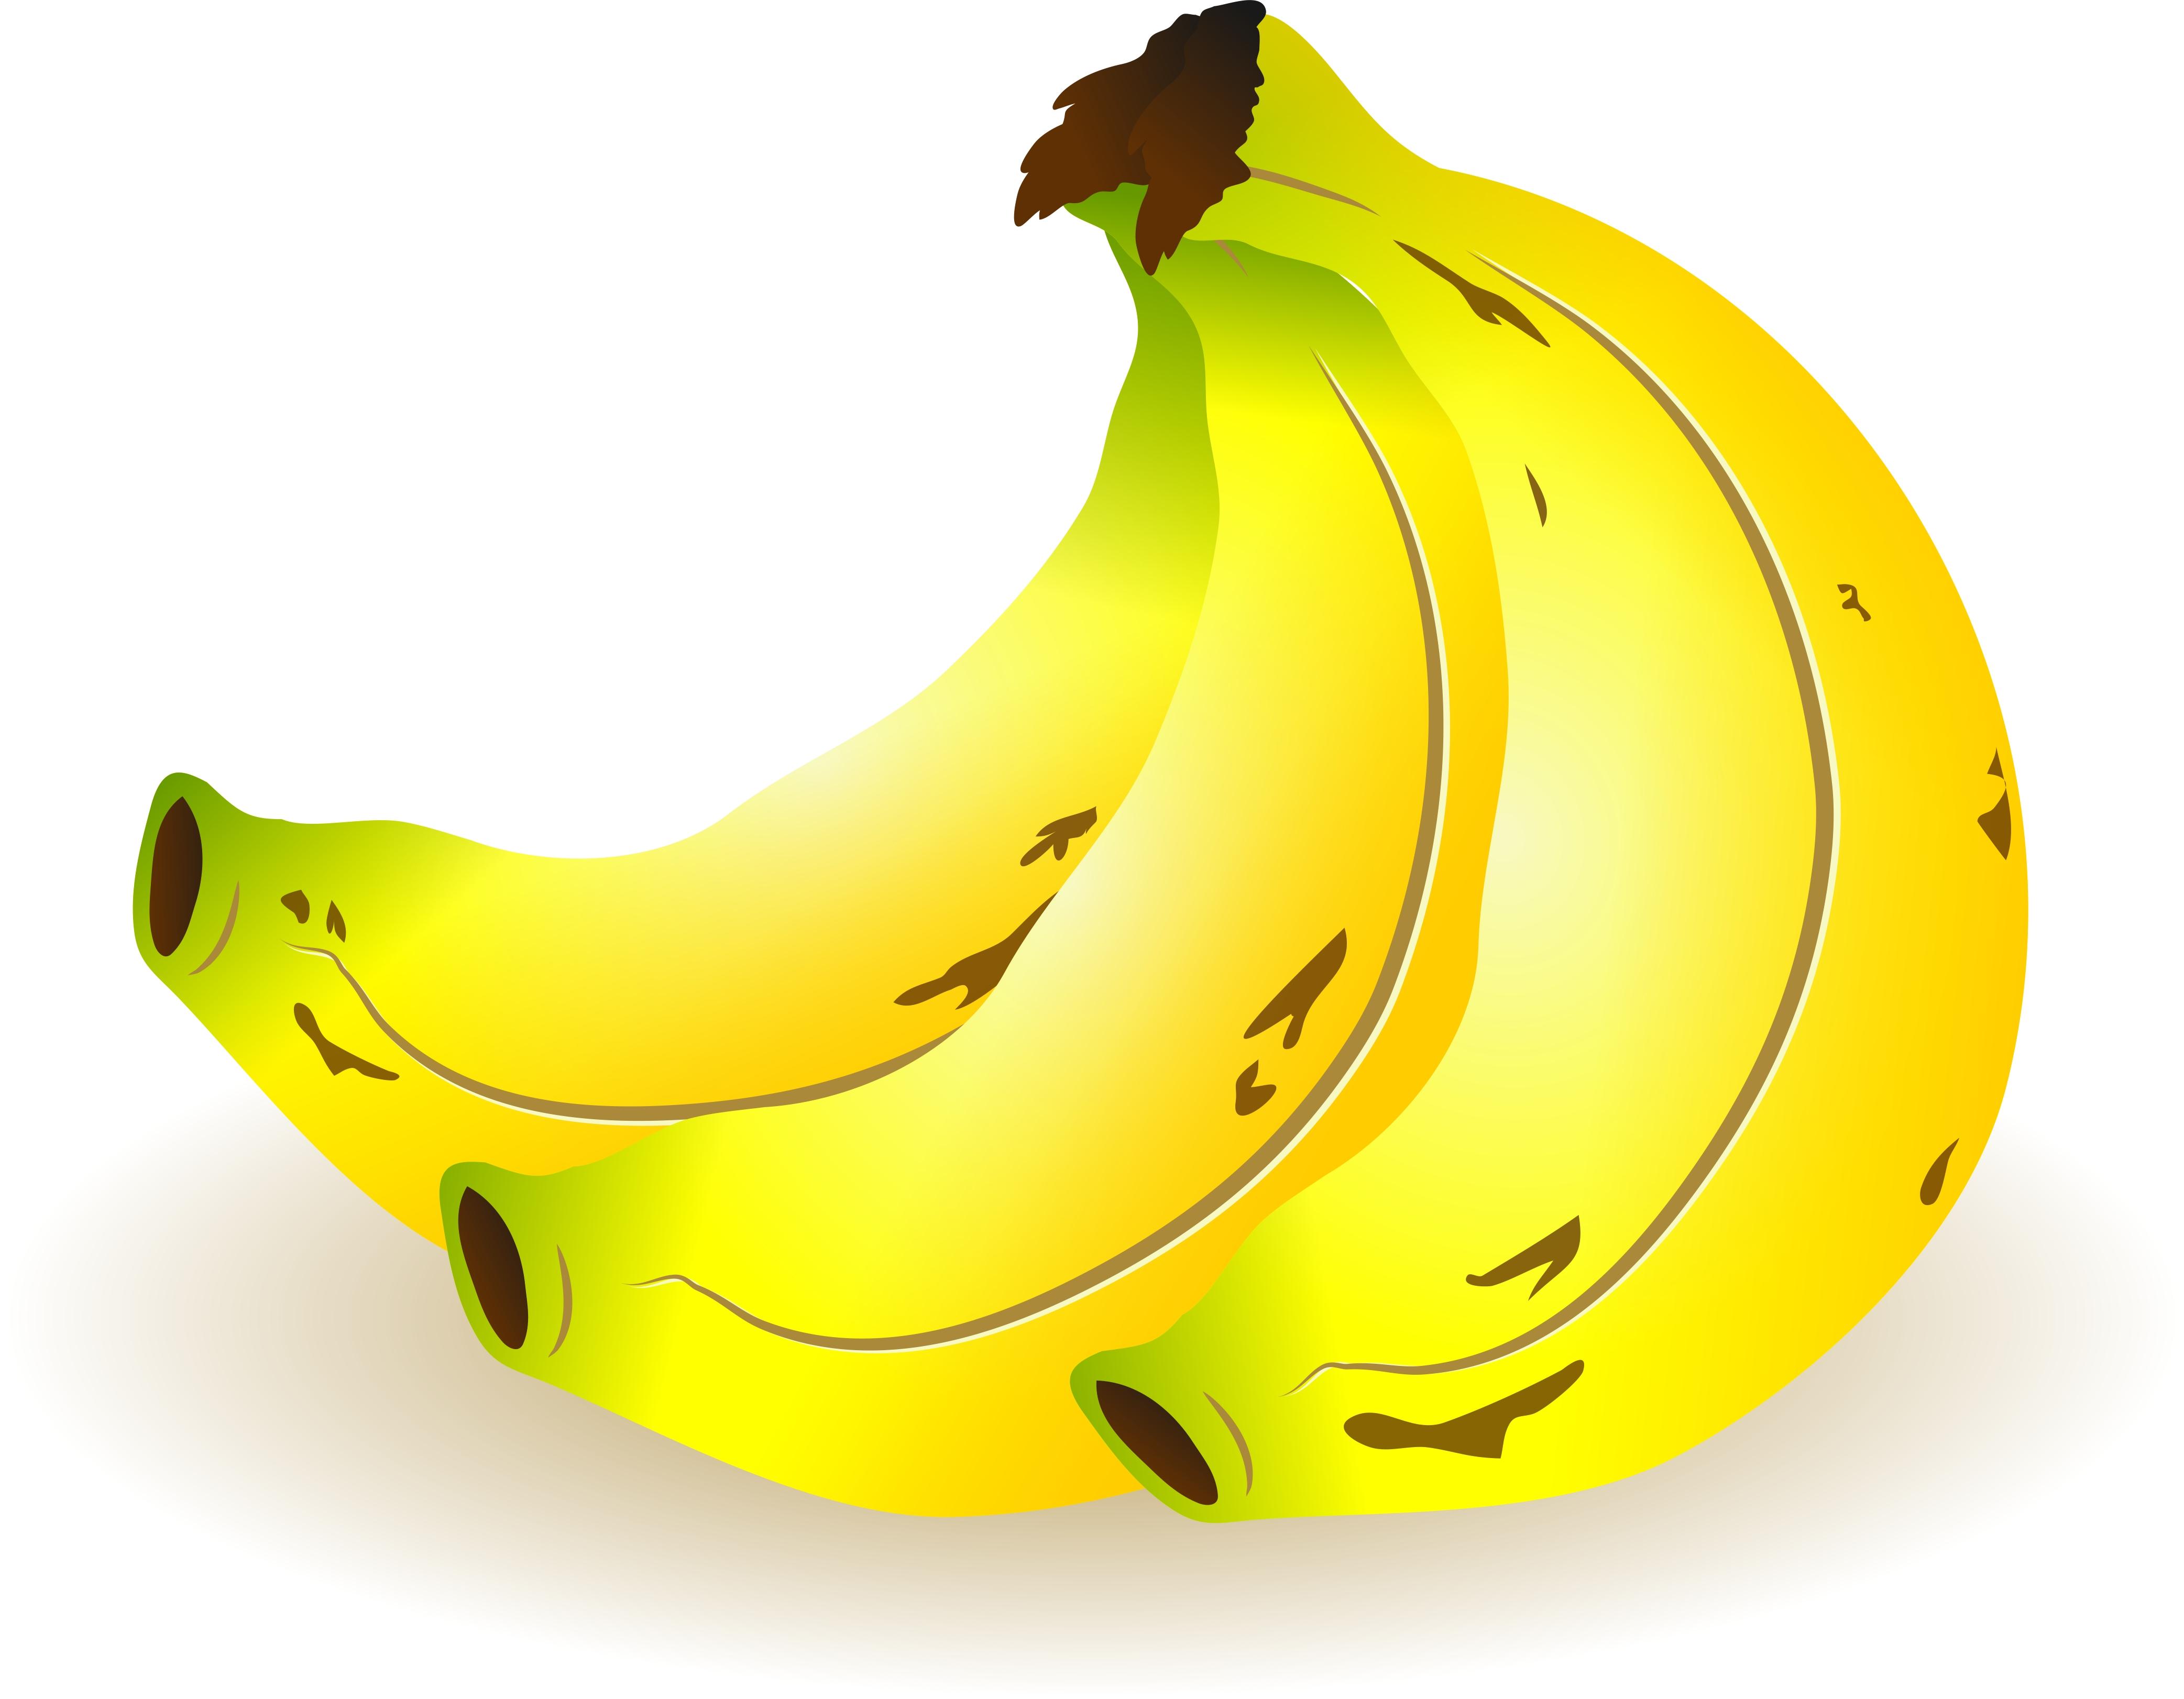 Banana clipart banana bunch Image Pictures  Clip Bananas